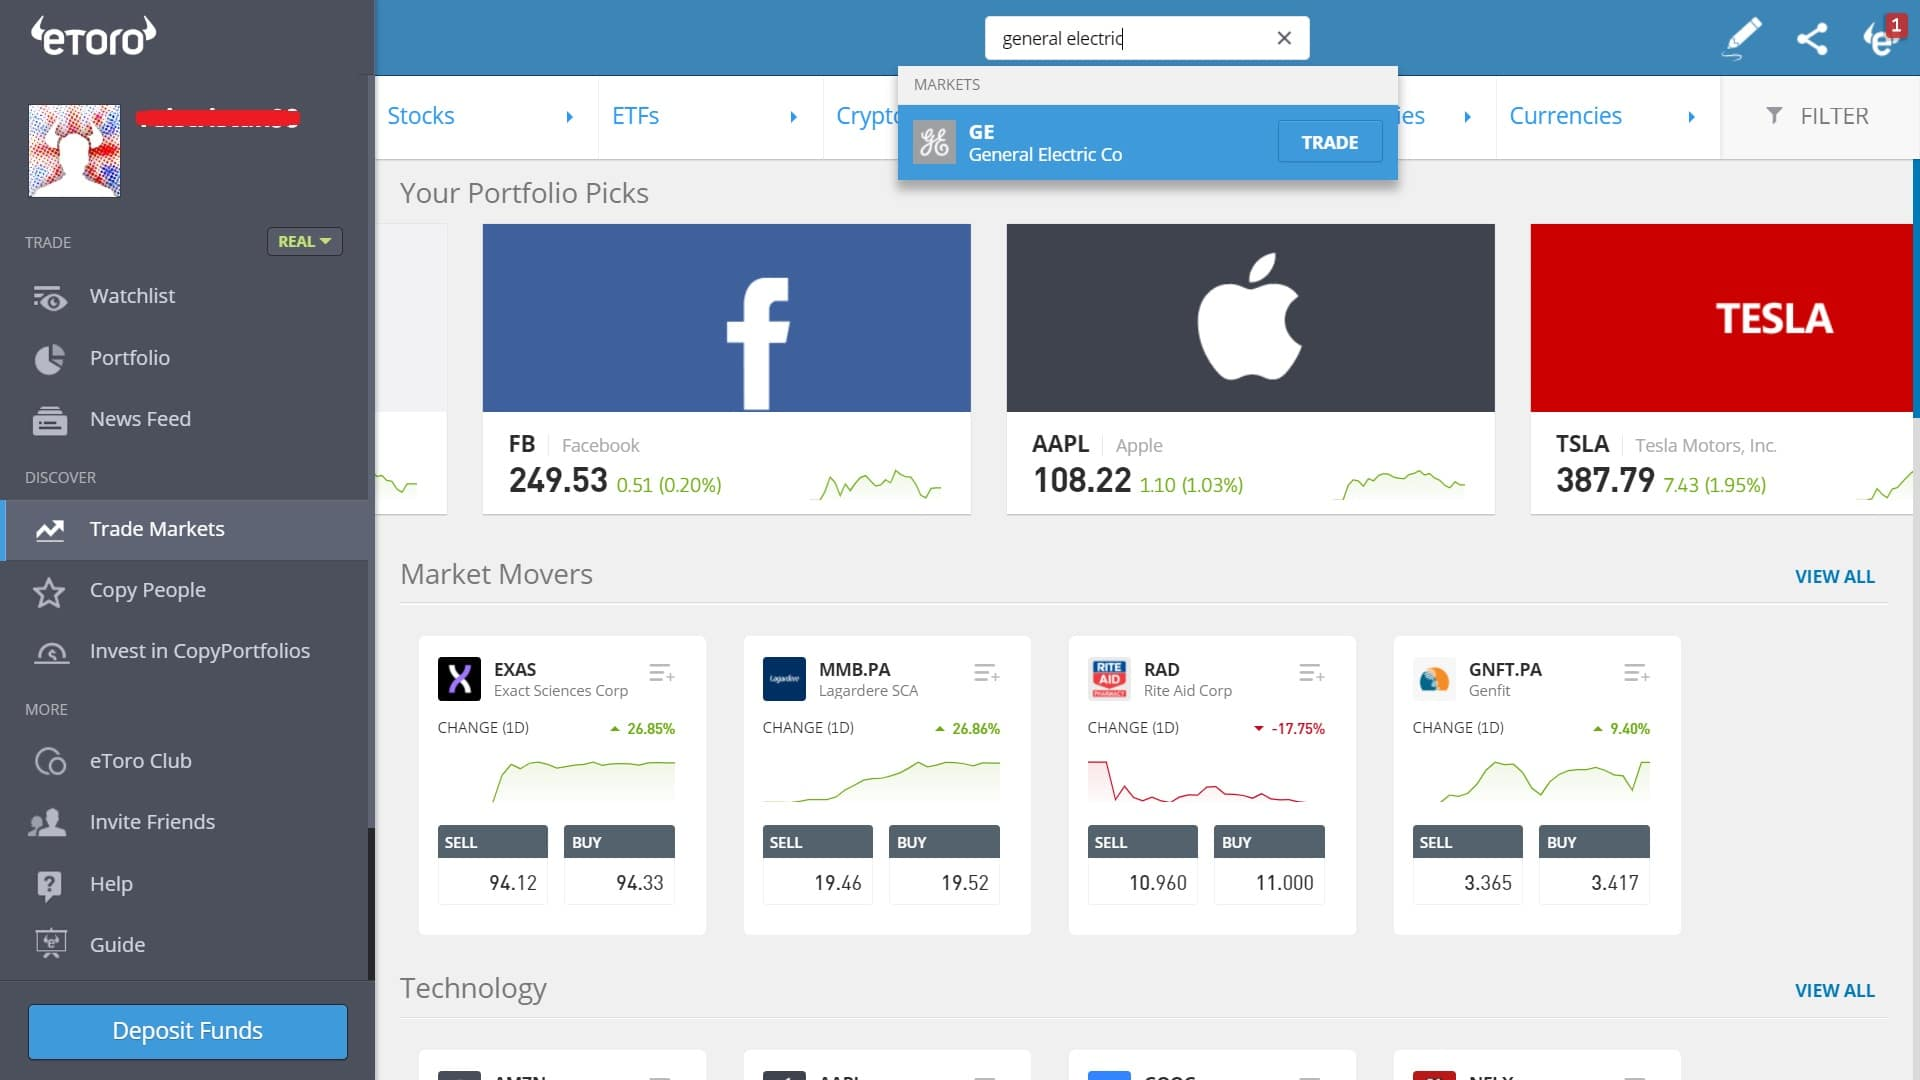 Searching for GE stock on eToro's platform